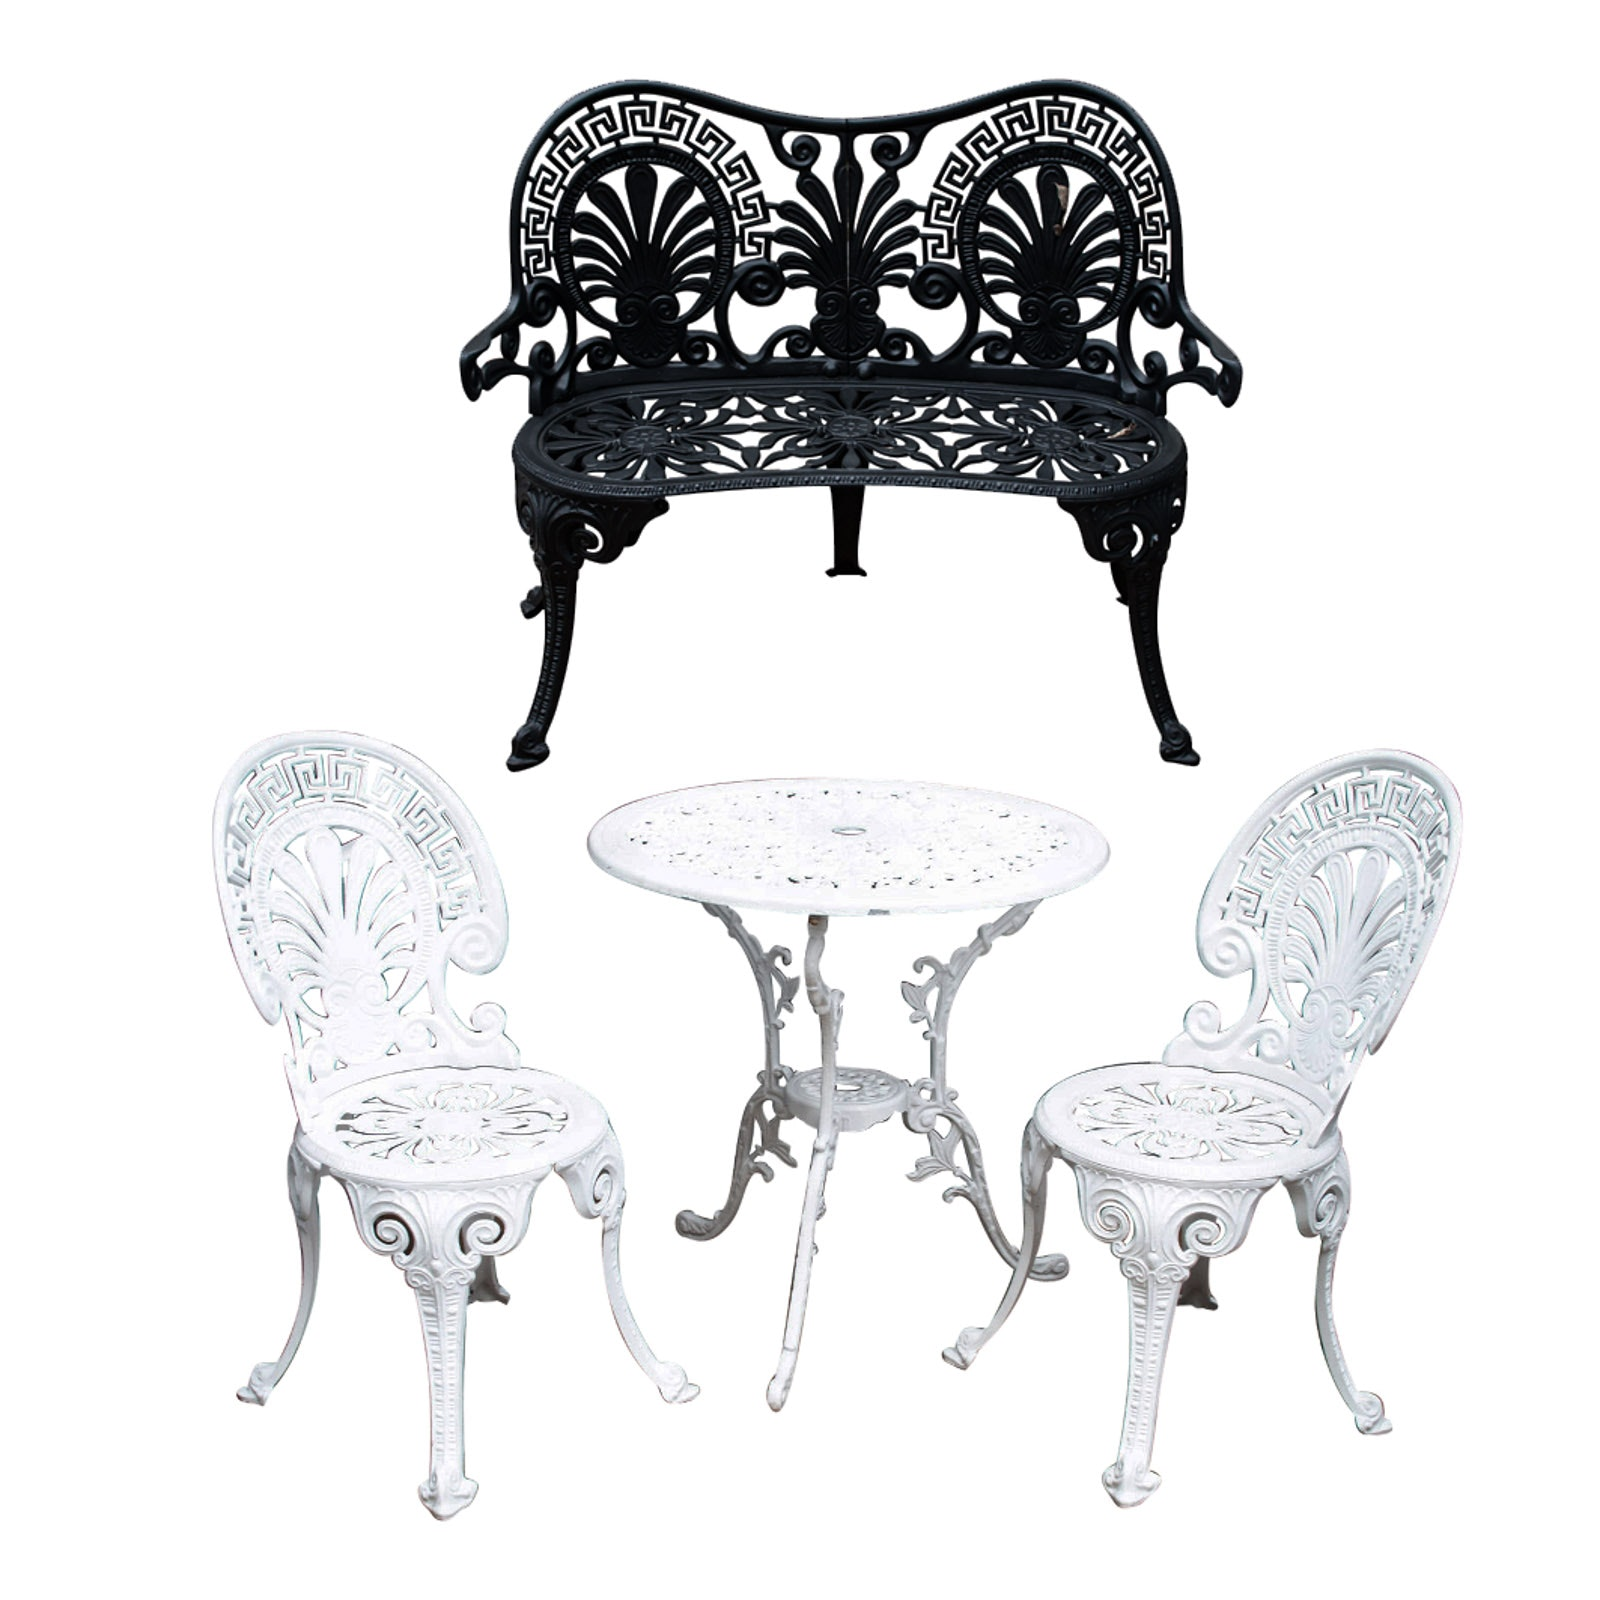 four piece cast metal outdoor furniture grouping ebth rh ebth com Cast Iron Outdoor Furniture Modern Outdoor Furniture